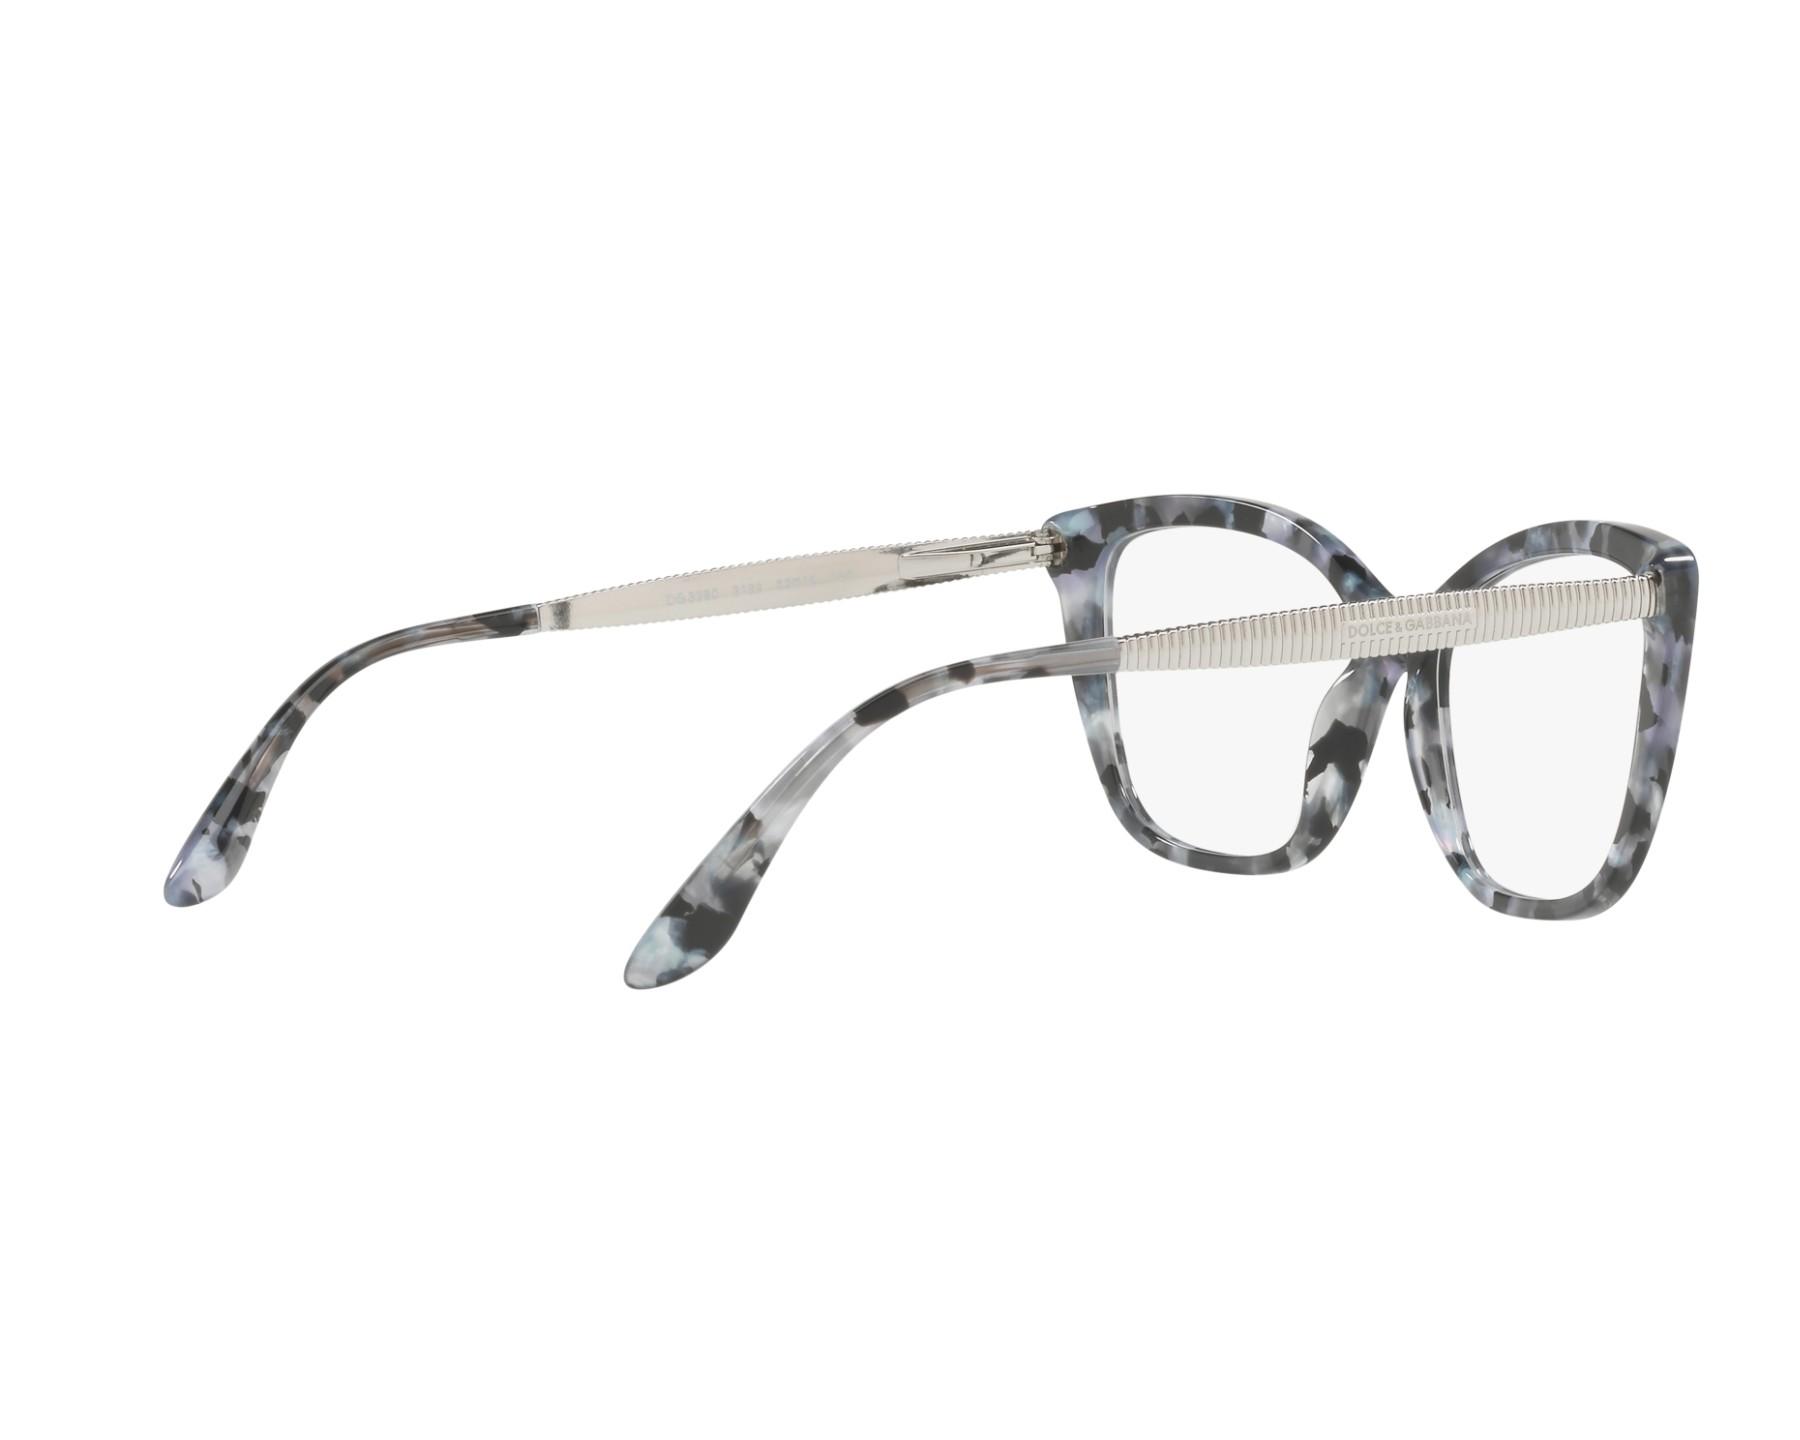 0c07a27b04b Dolce   Gabbana Eyeglasses DG-3280 3132 Black